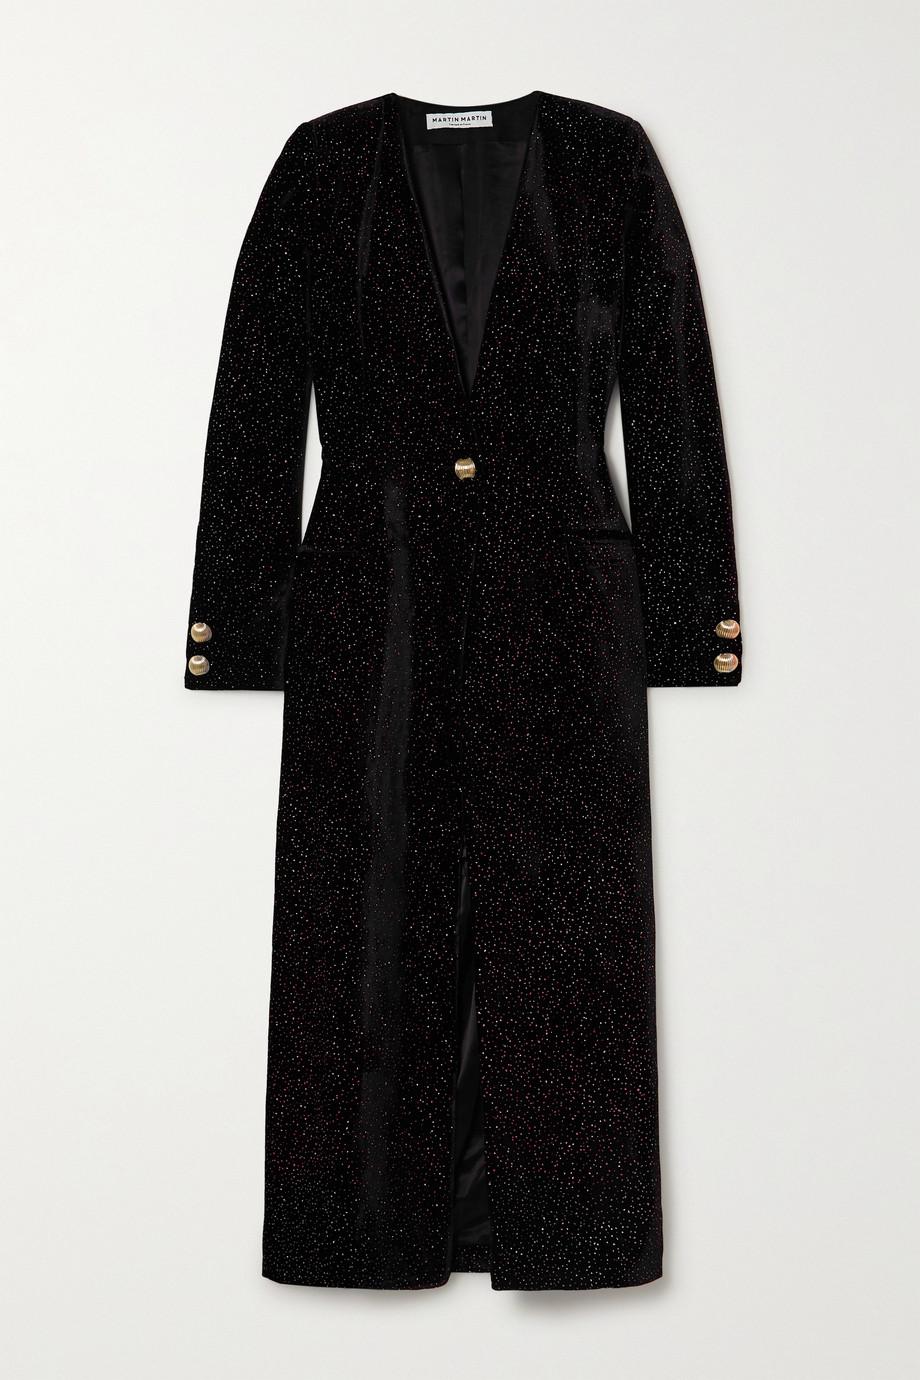 MARTIN MARTIN Victoria glittered velvet coat